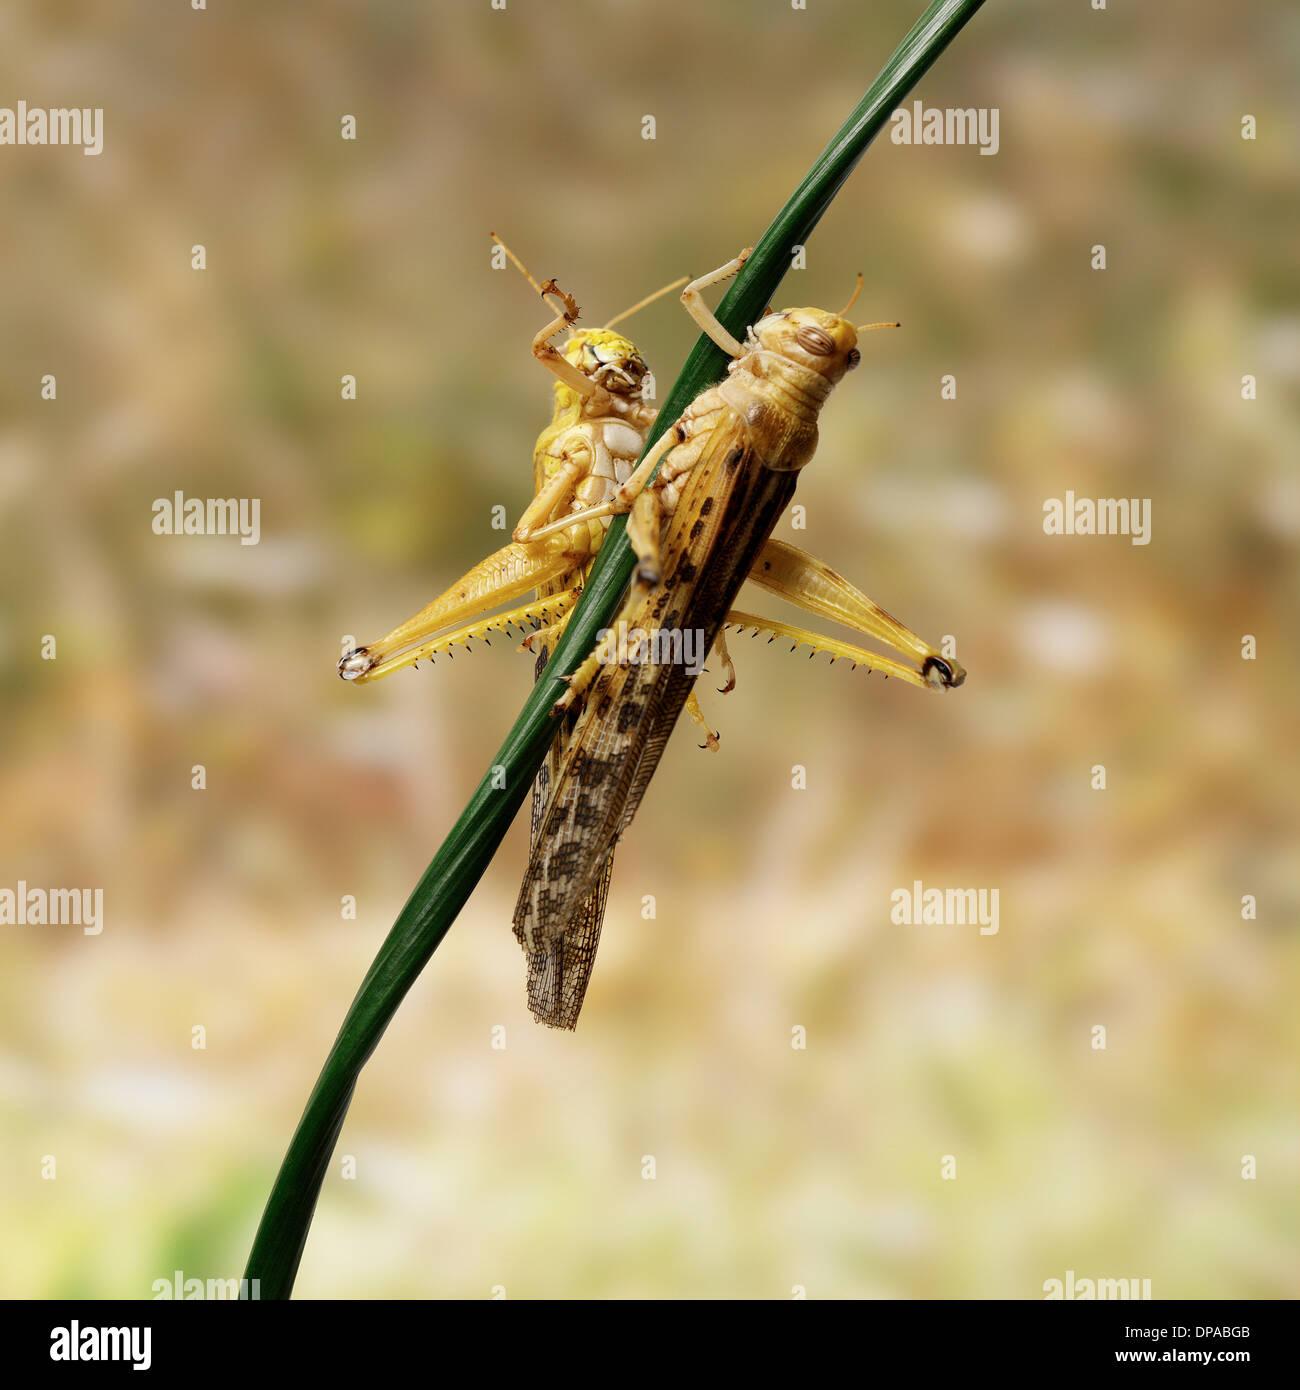 Desert Locusts on twig - Stock Image